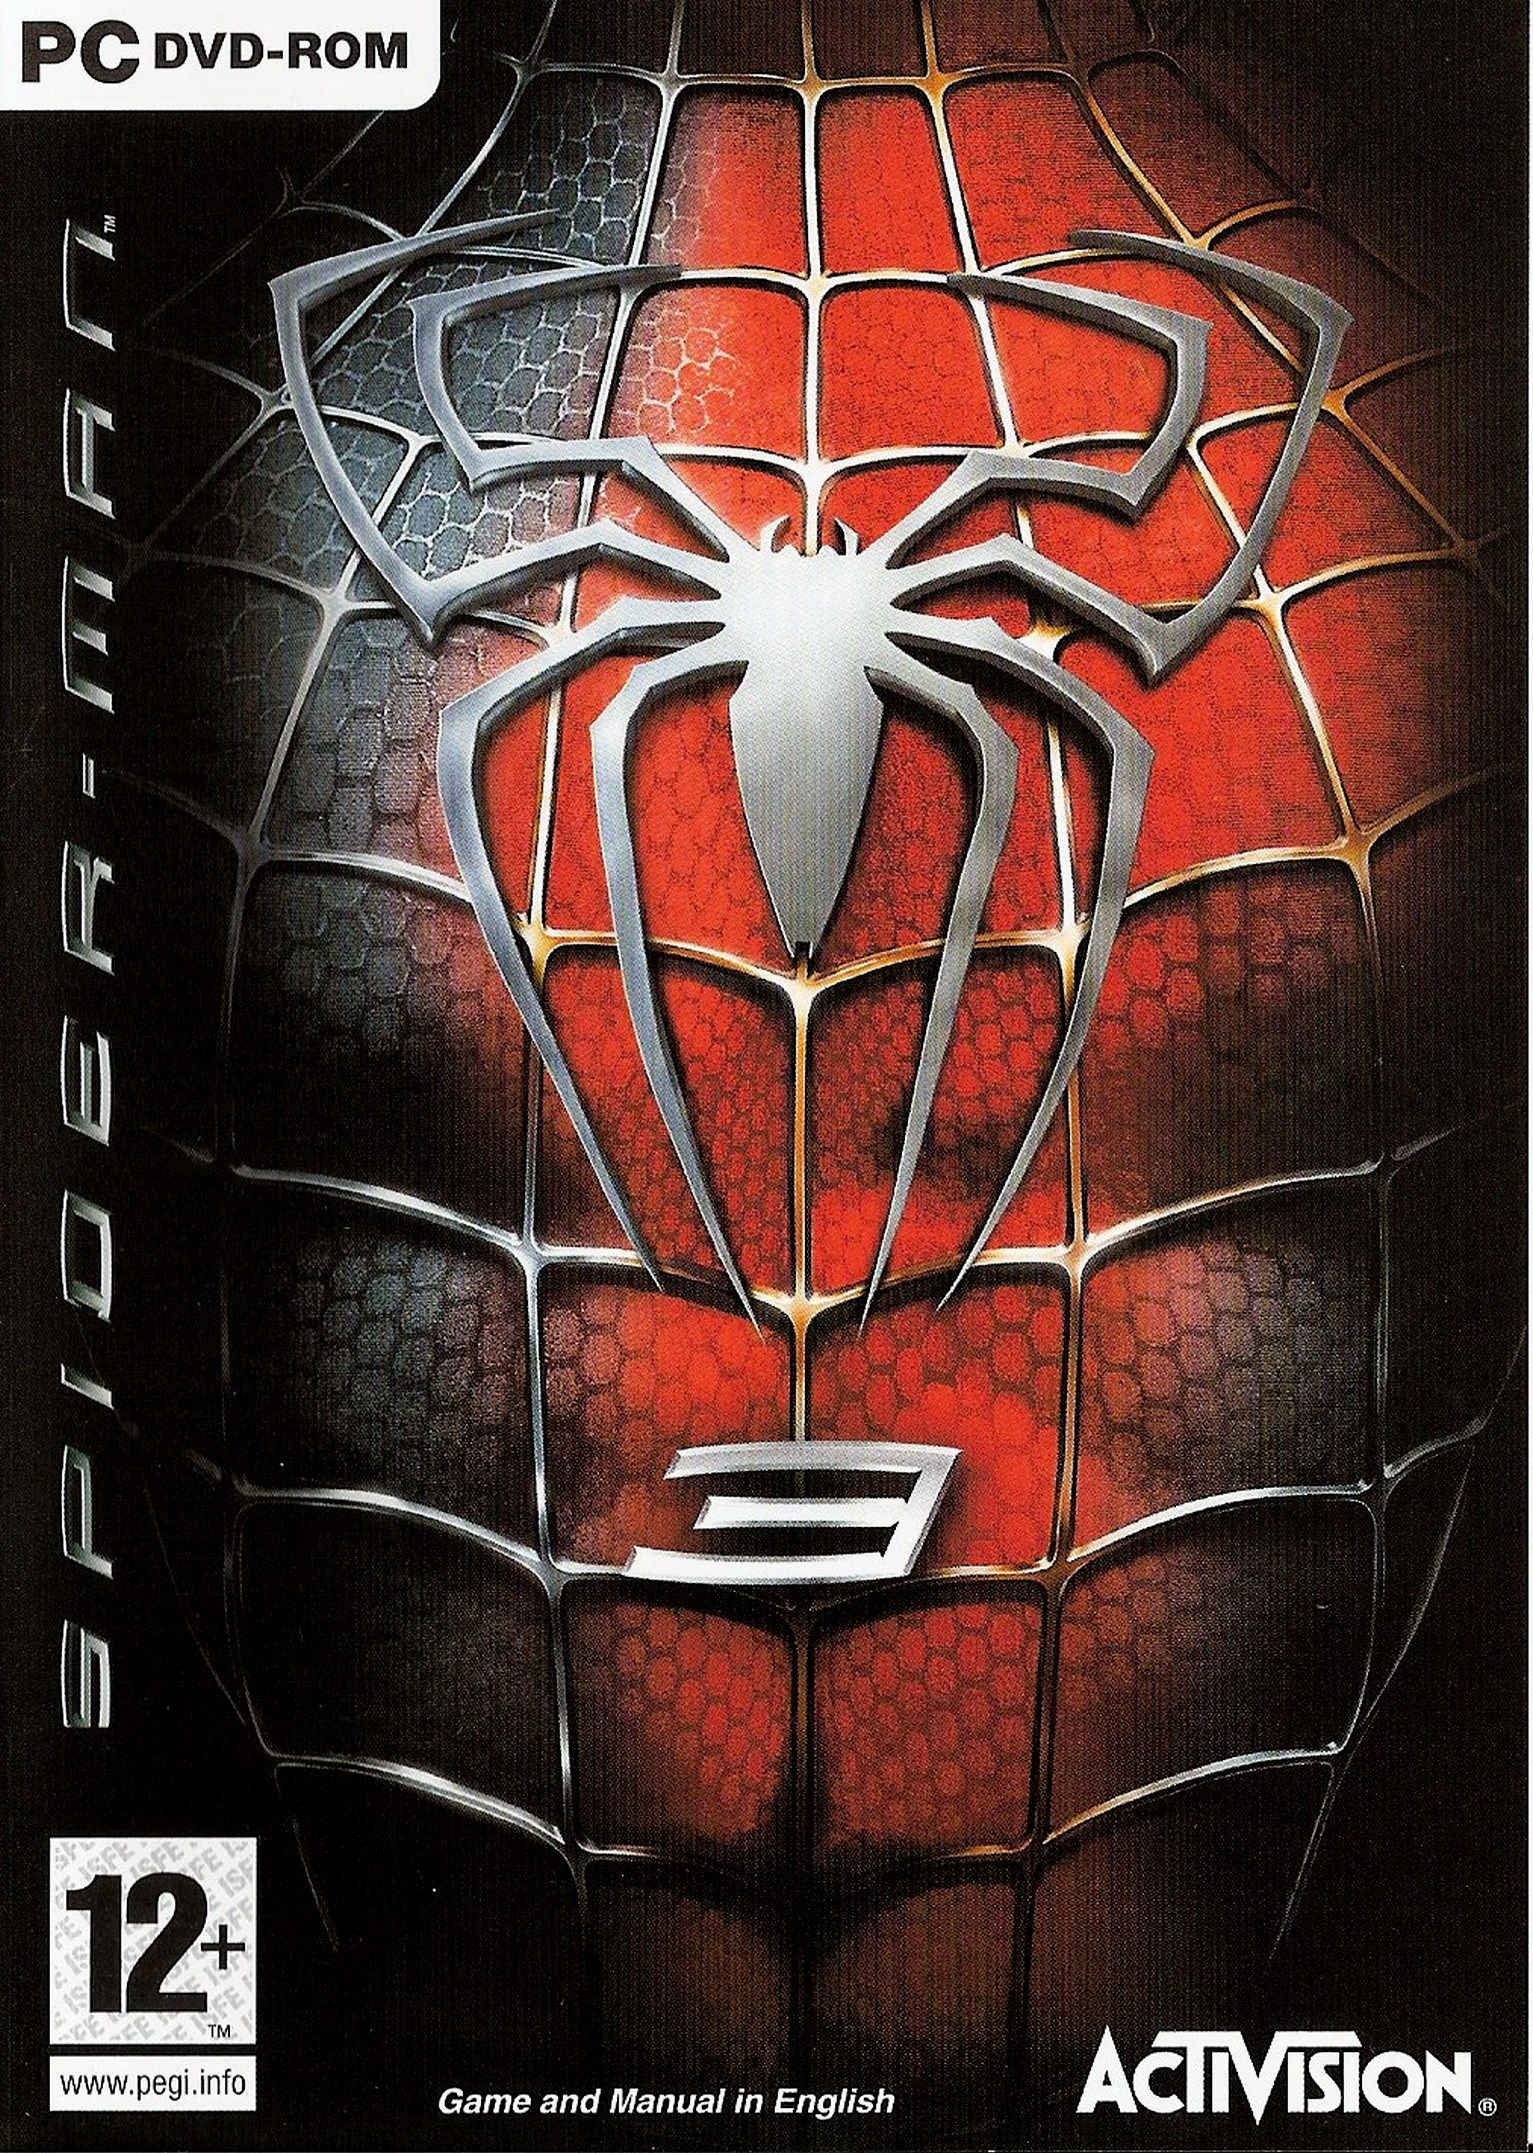 Человек-Паук 3 / Spider-Man 3: The Game [v1.0.0.1] (2007) PC